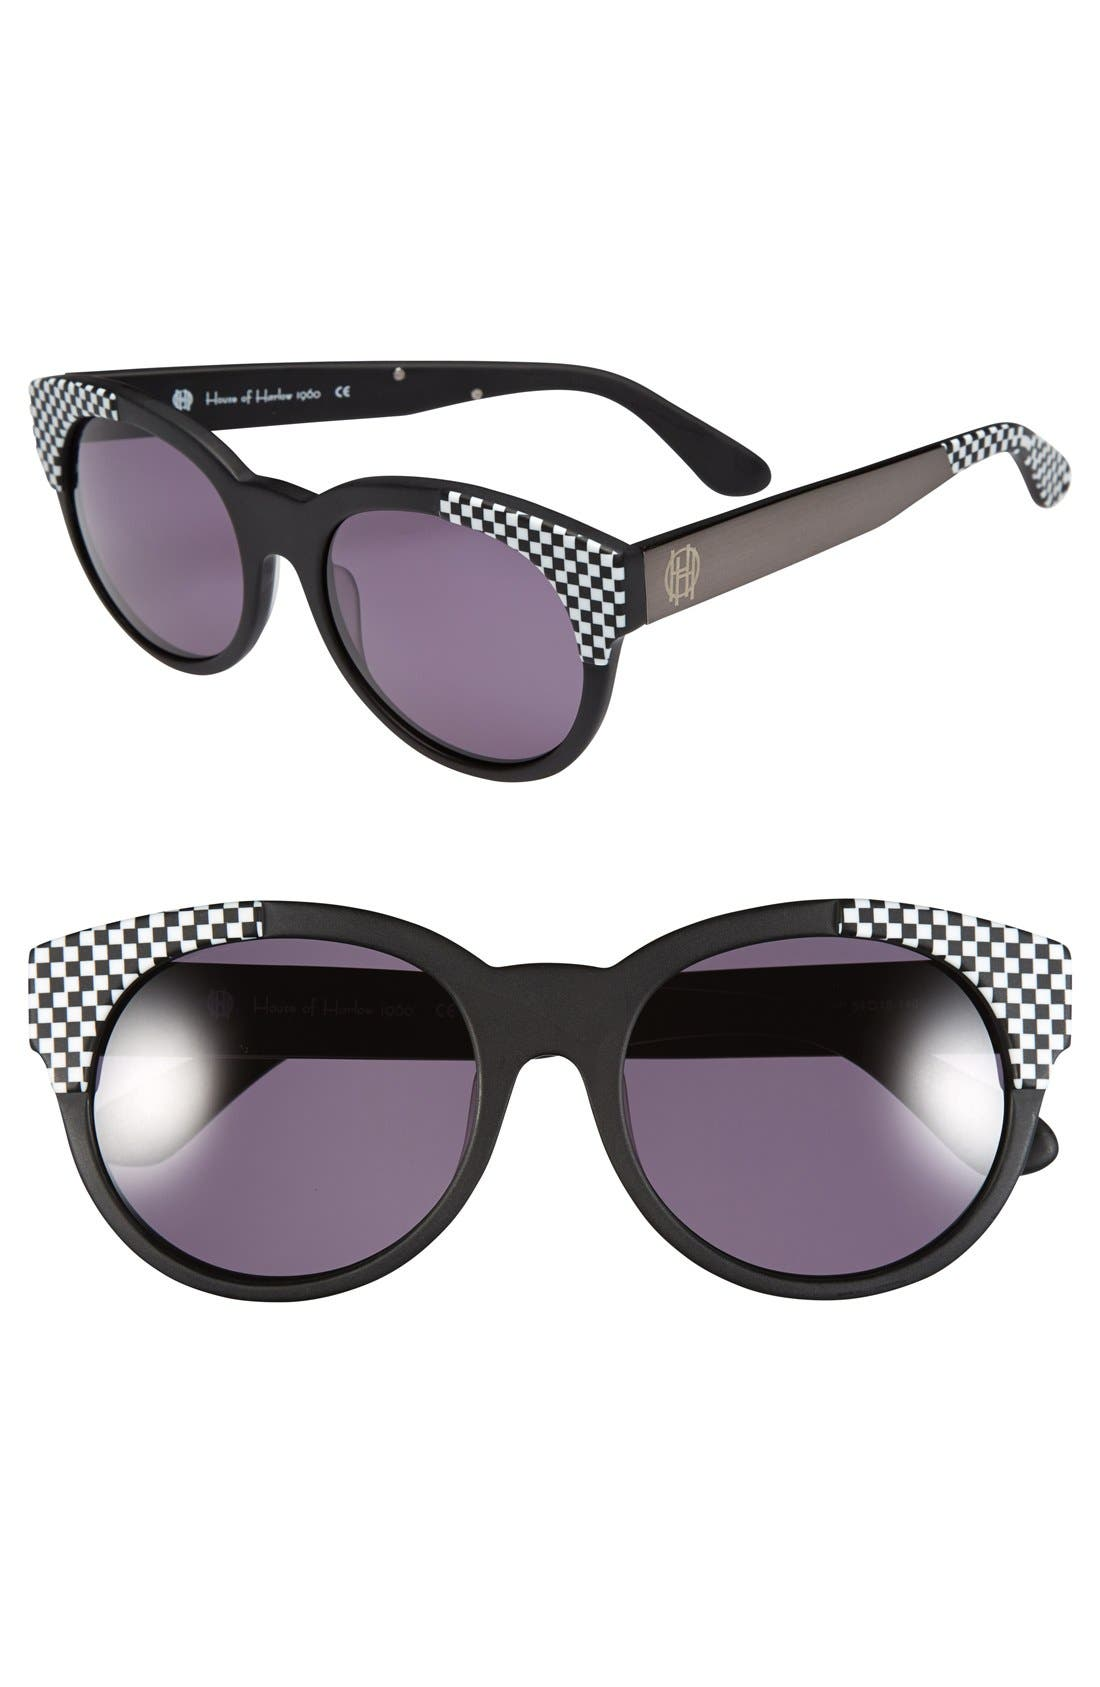 Main Image - House of Harlow 1960 'Adalyn' 54mm Sunglasses